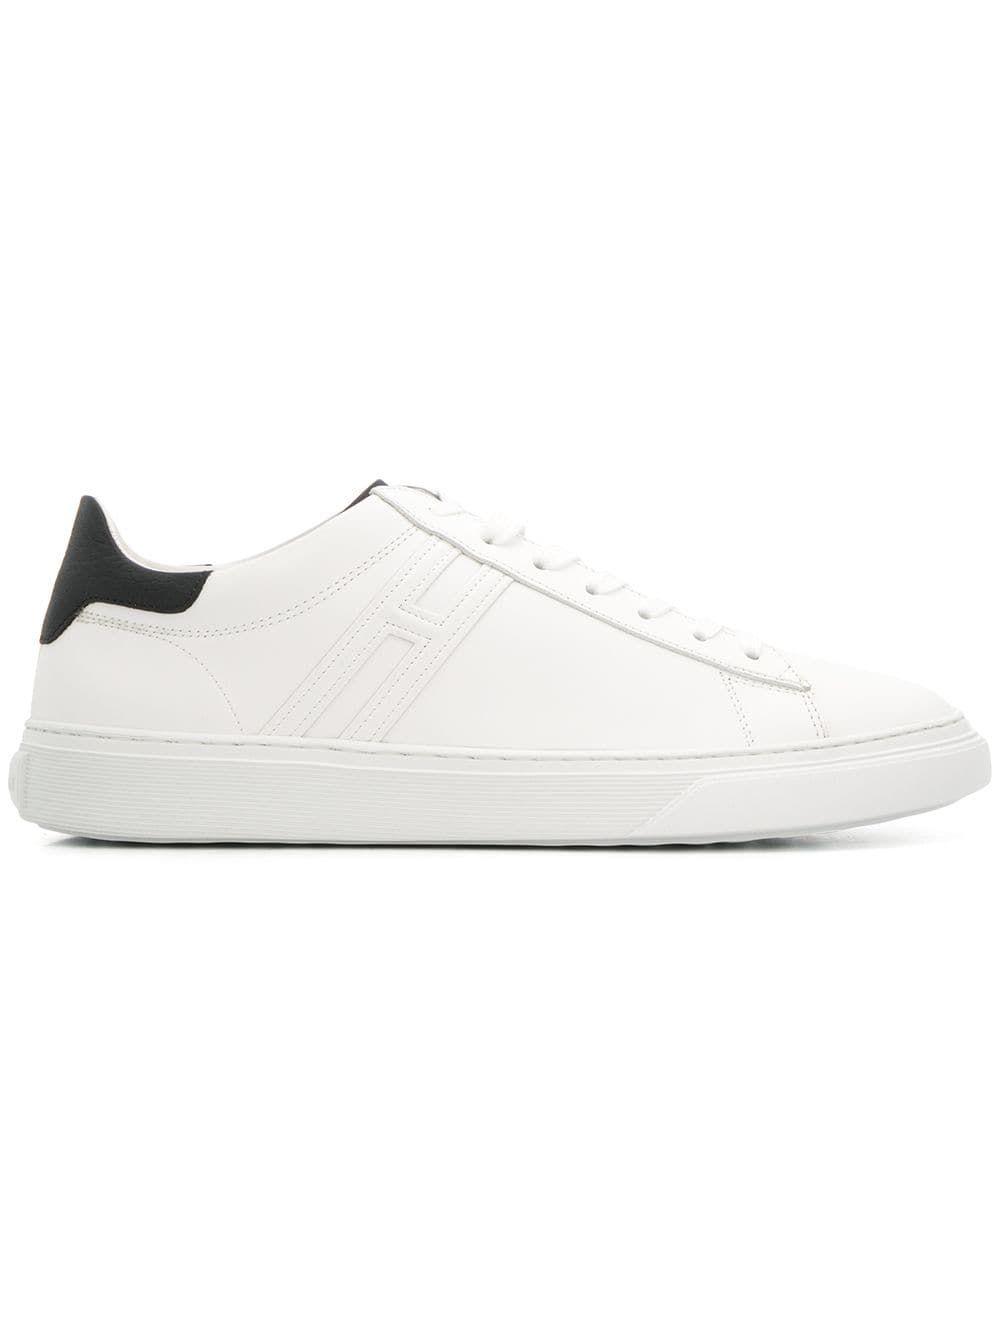 Hogan Sneakers H365 Tal.nero Bianche In White   ModeSens ...